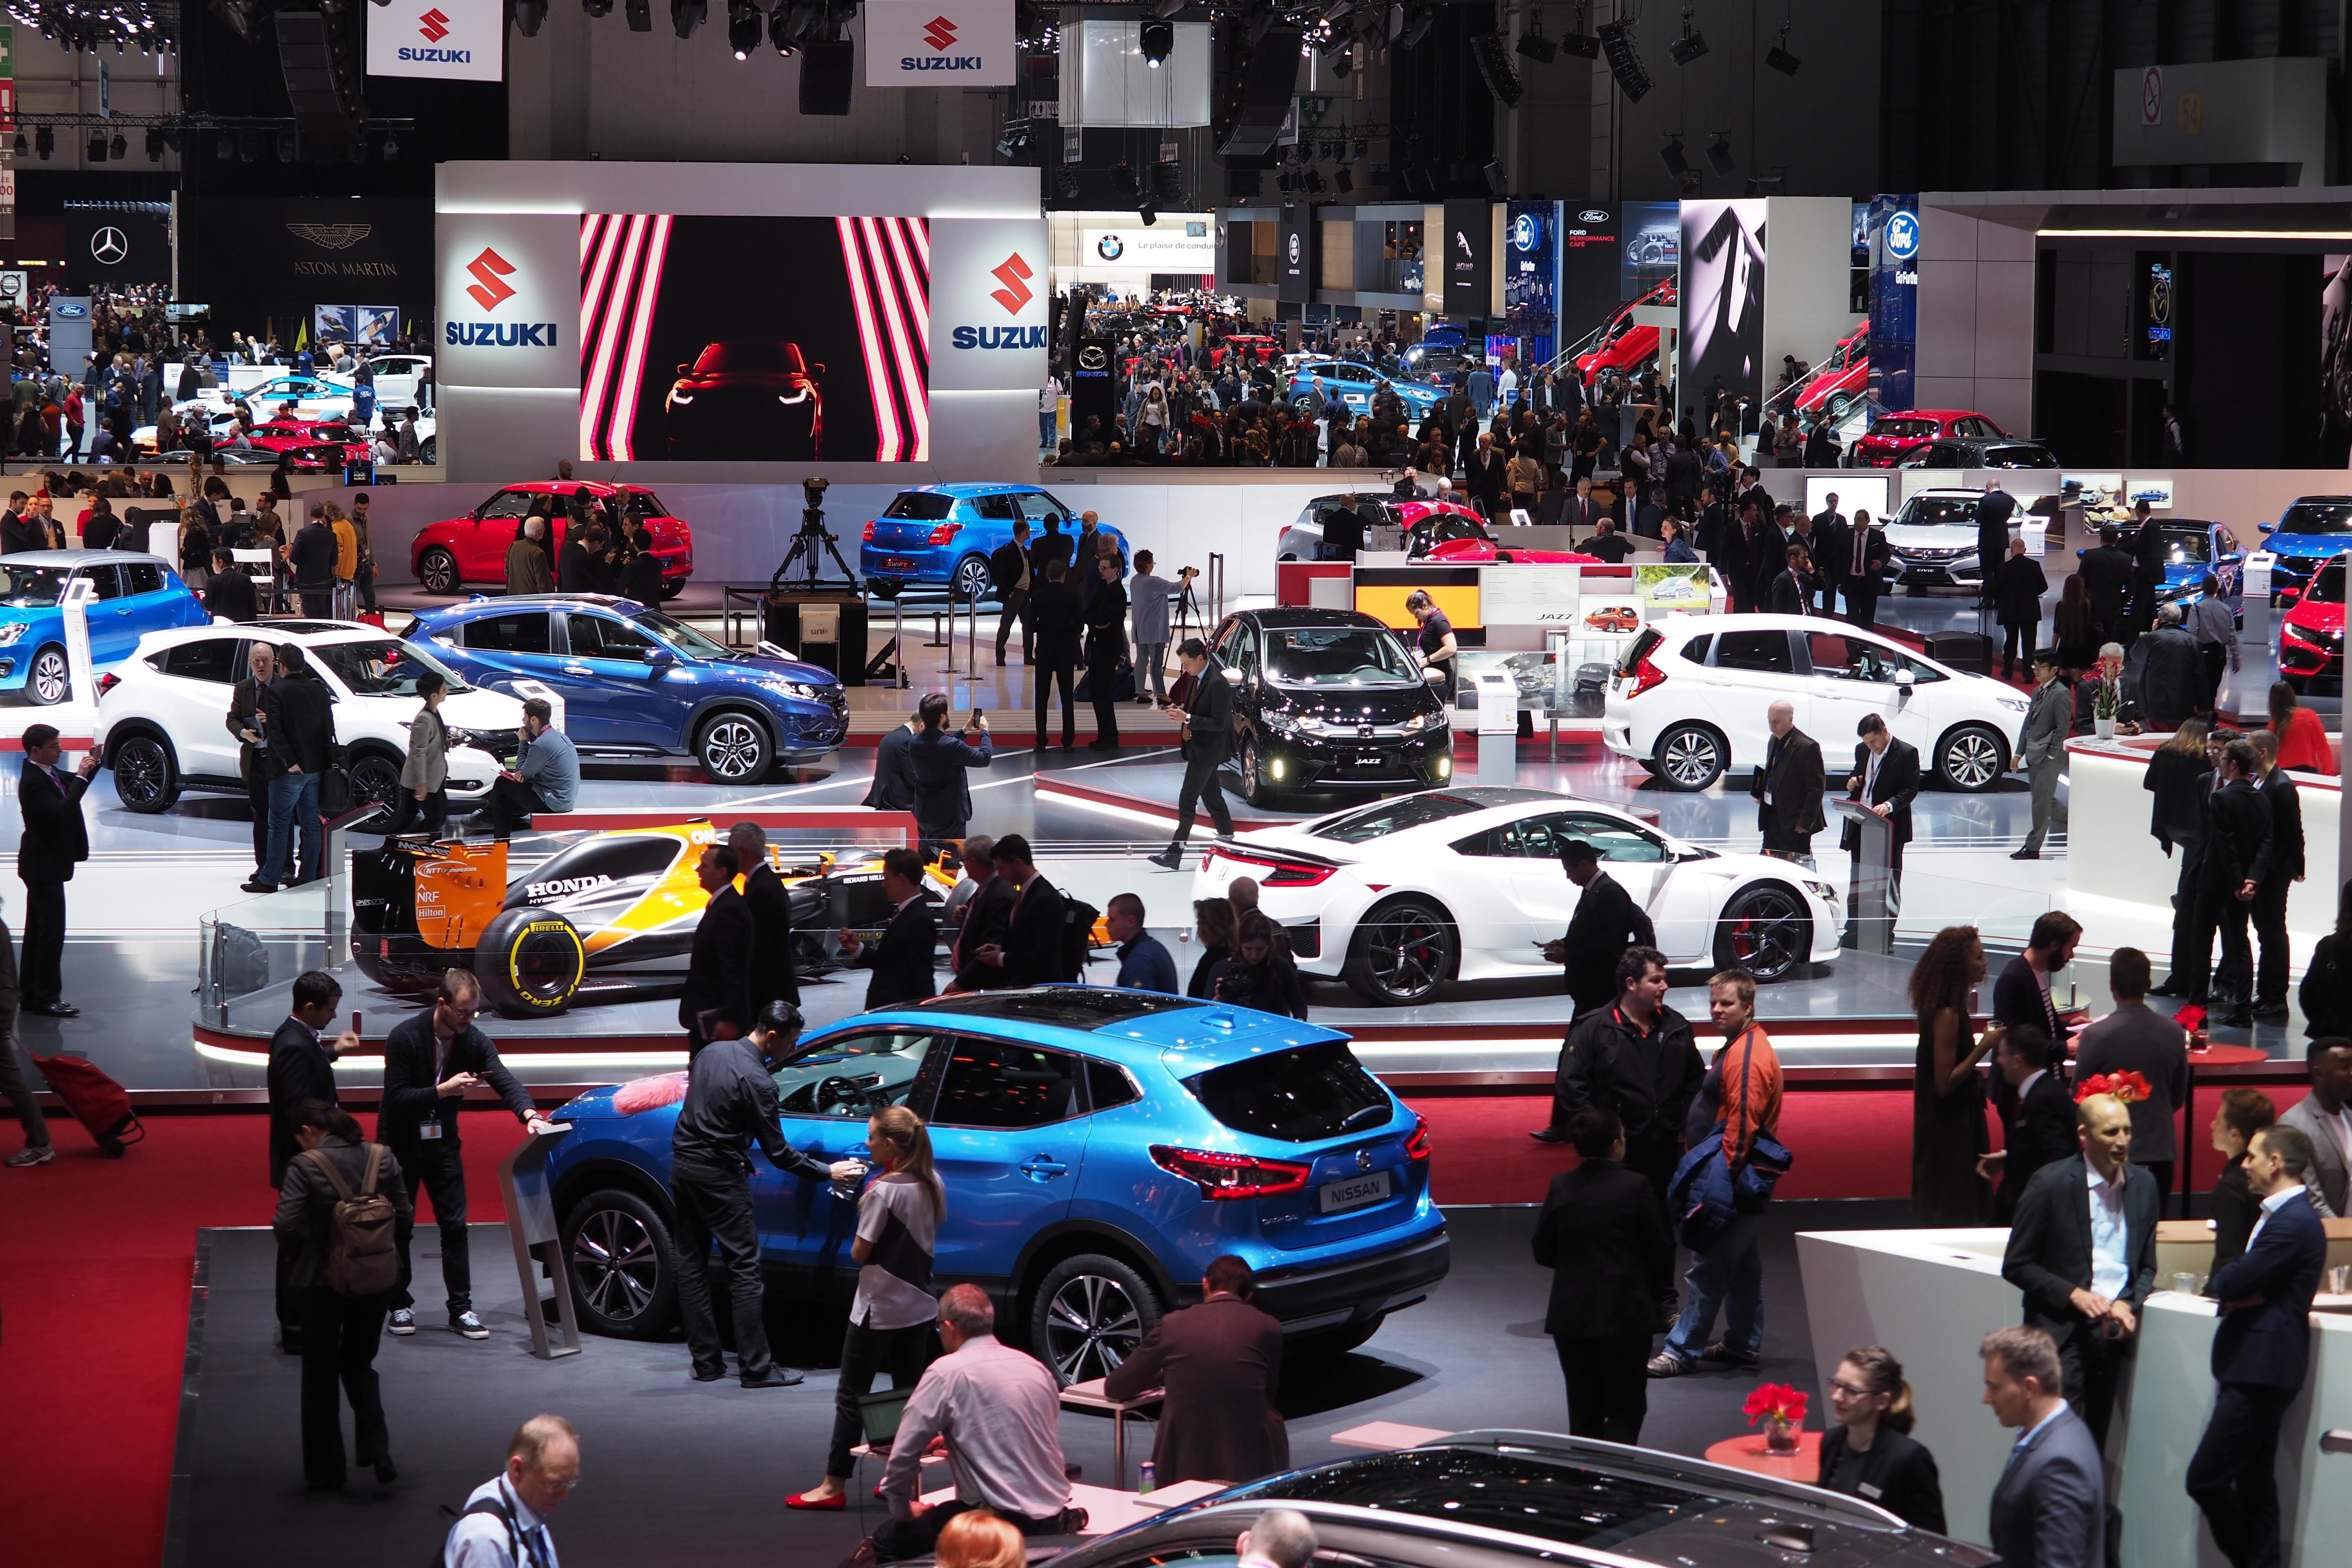 2017 Geneva International Motor Show Report